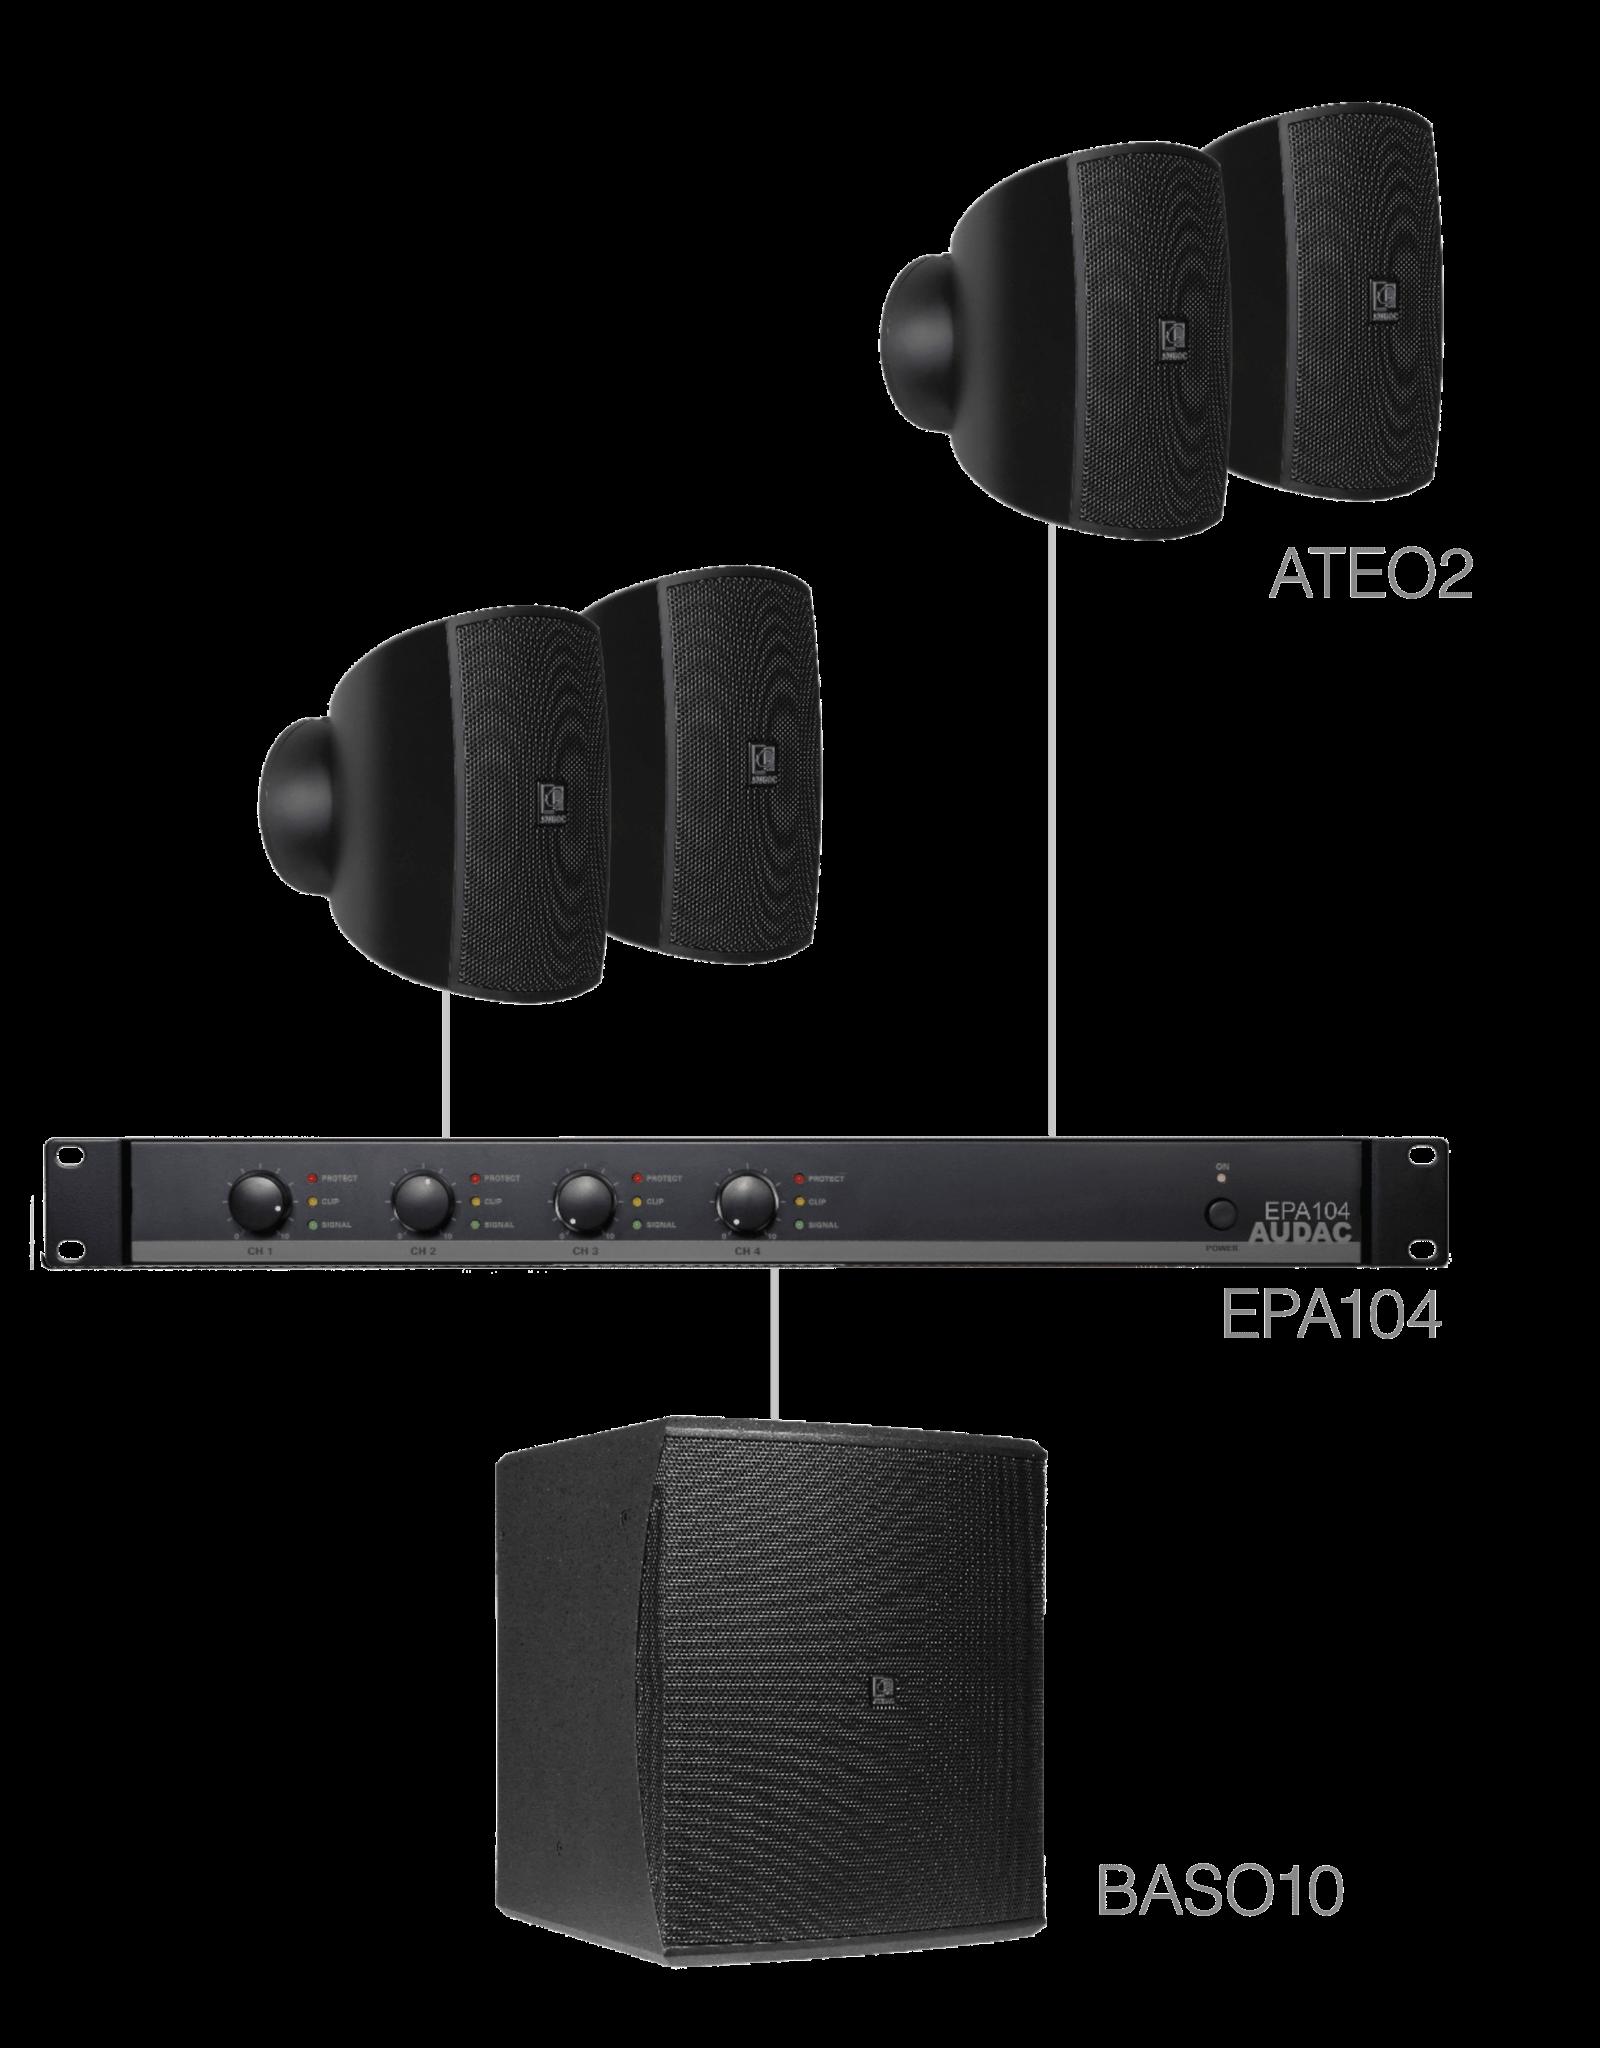 Audac 4 x ATEO2 + BASO10 + EPA104 Black